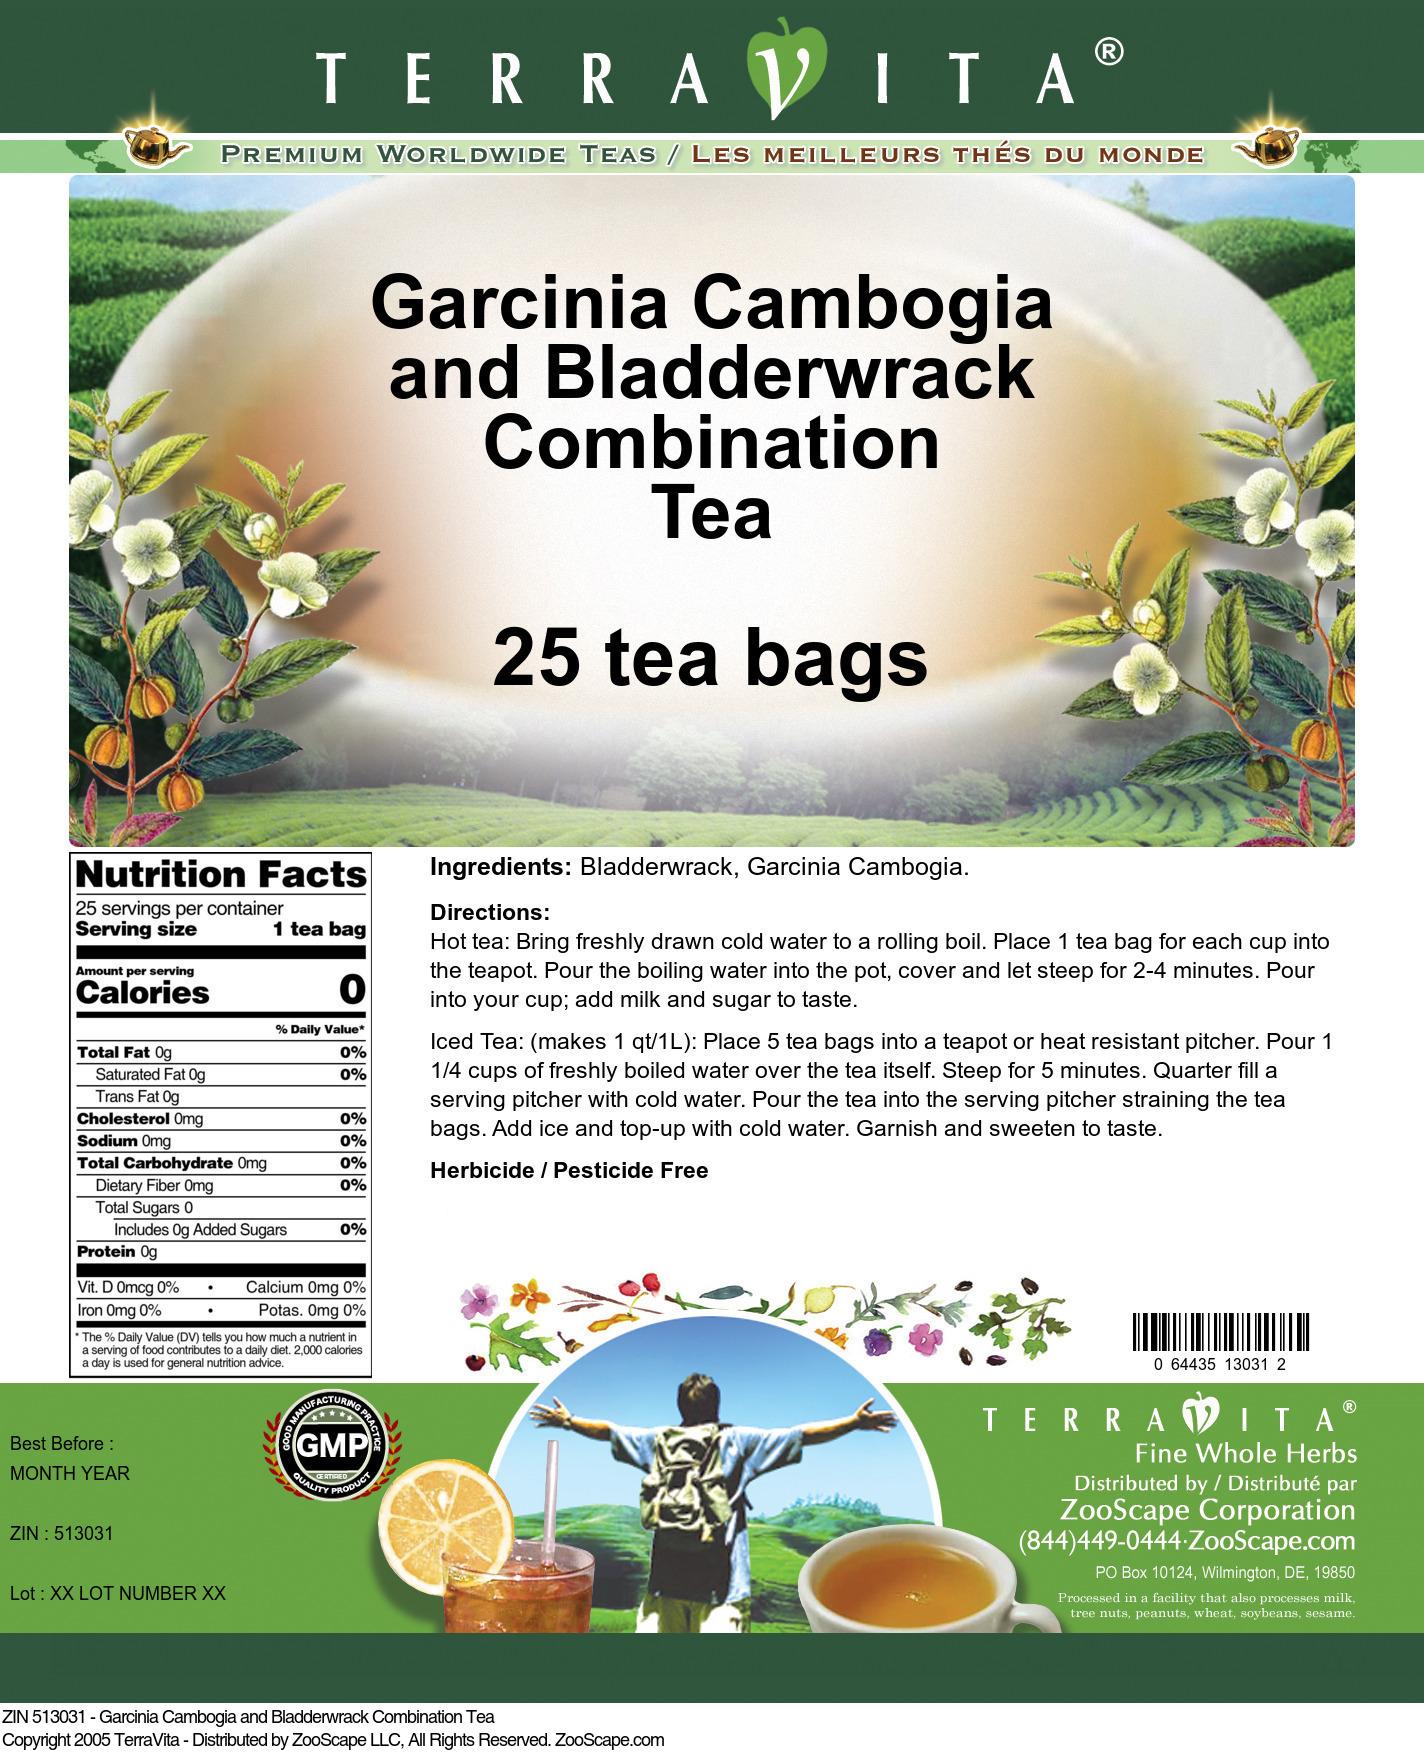 Garcinia Cambogia and Bladderwrack